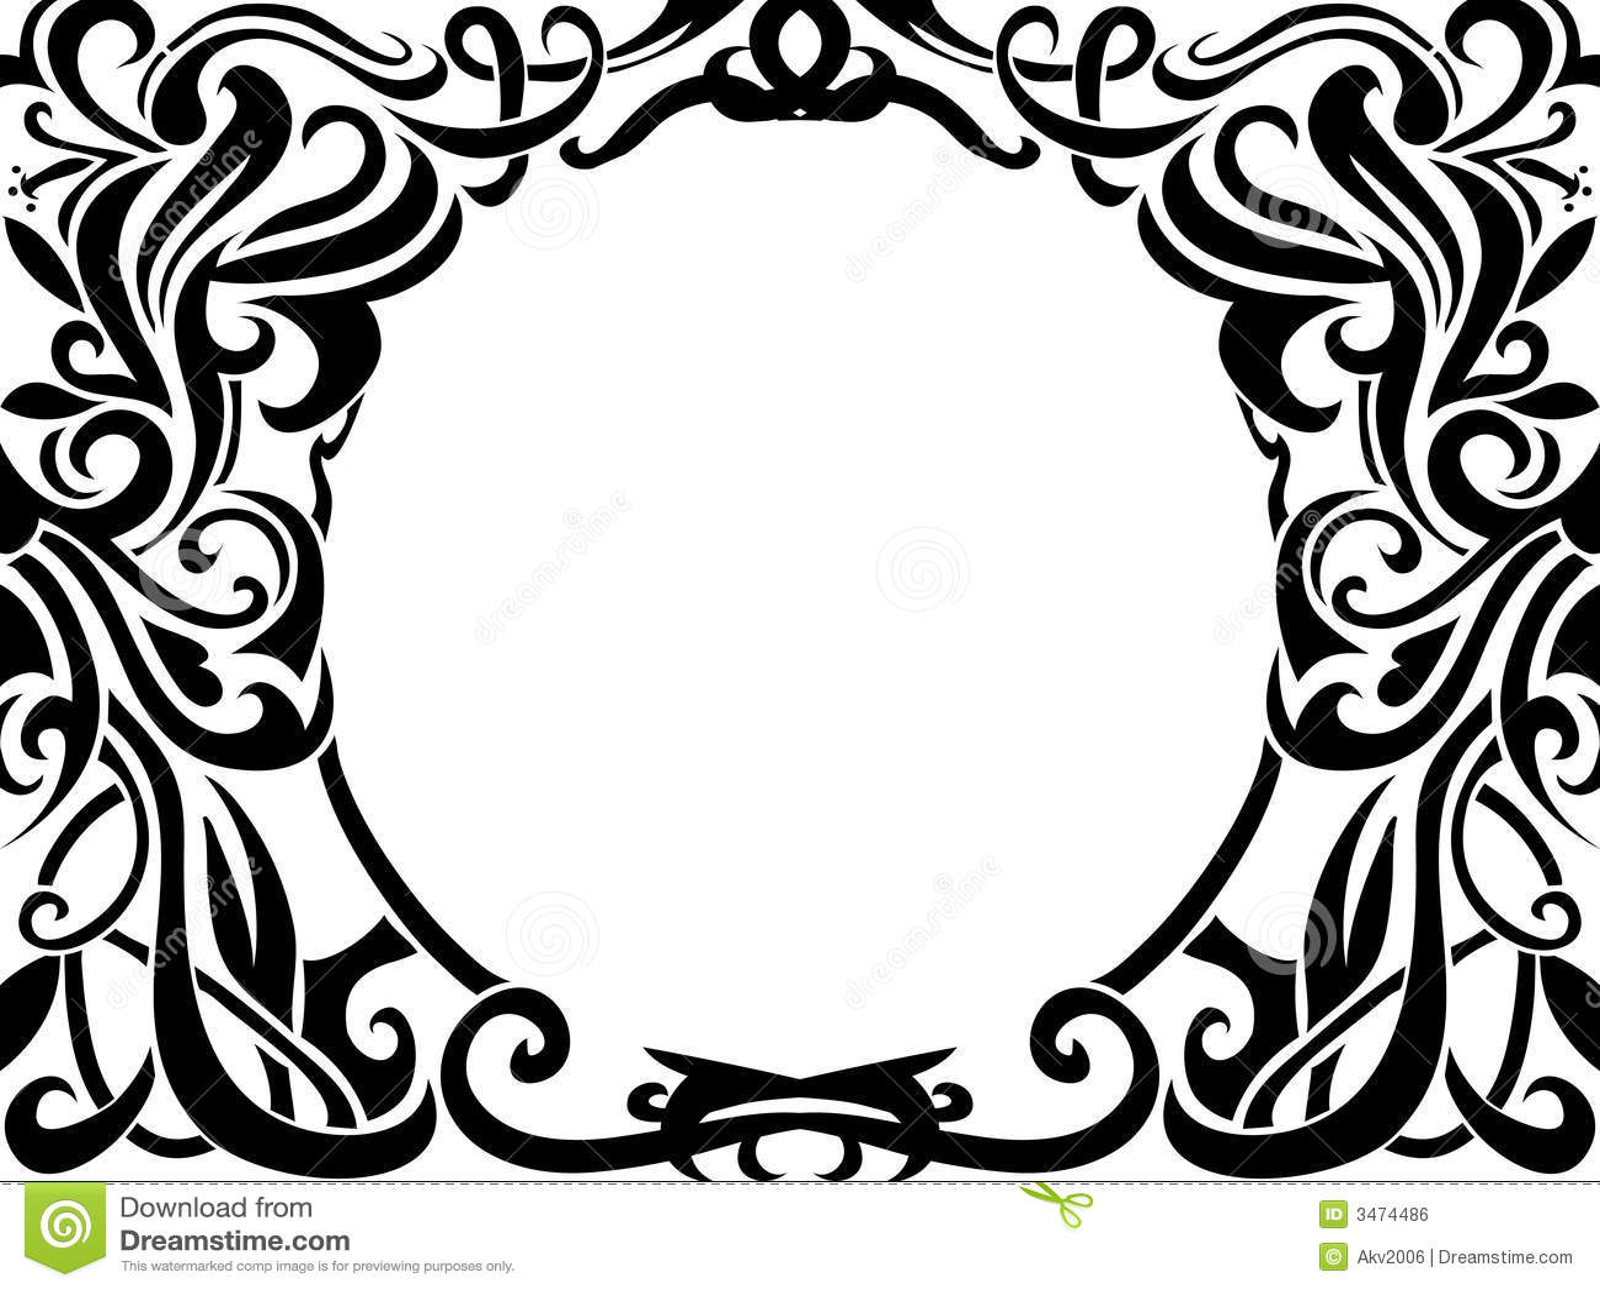 Tribal Art Frame Royalty Free Stock Image Image 3474486